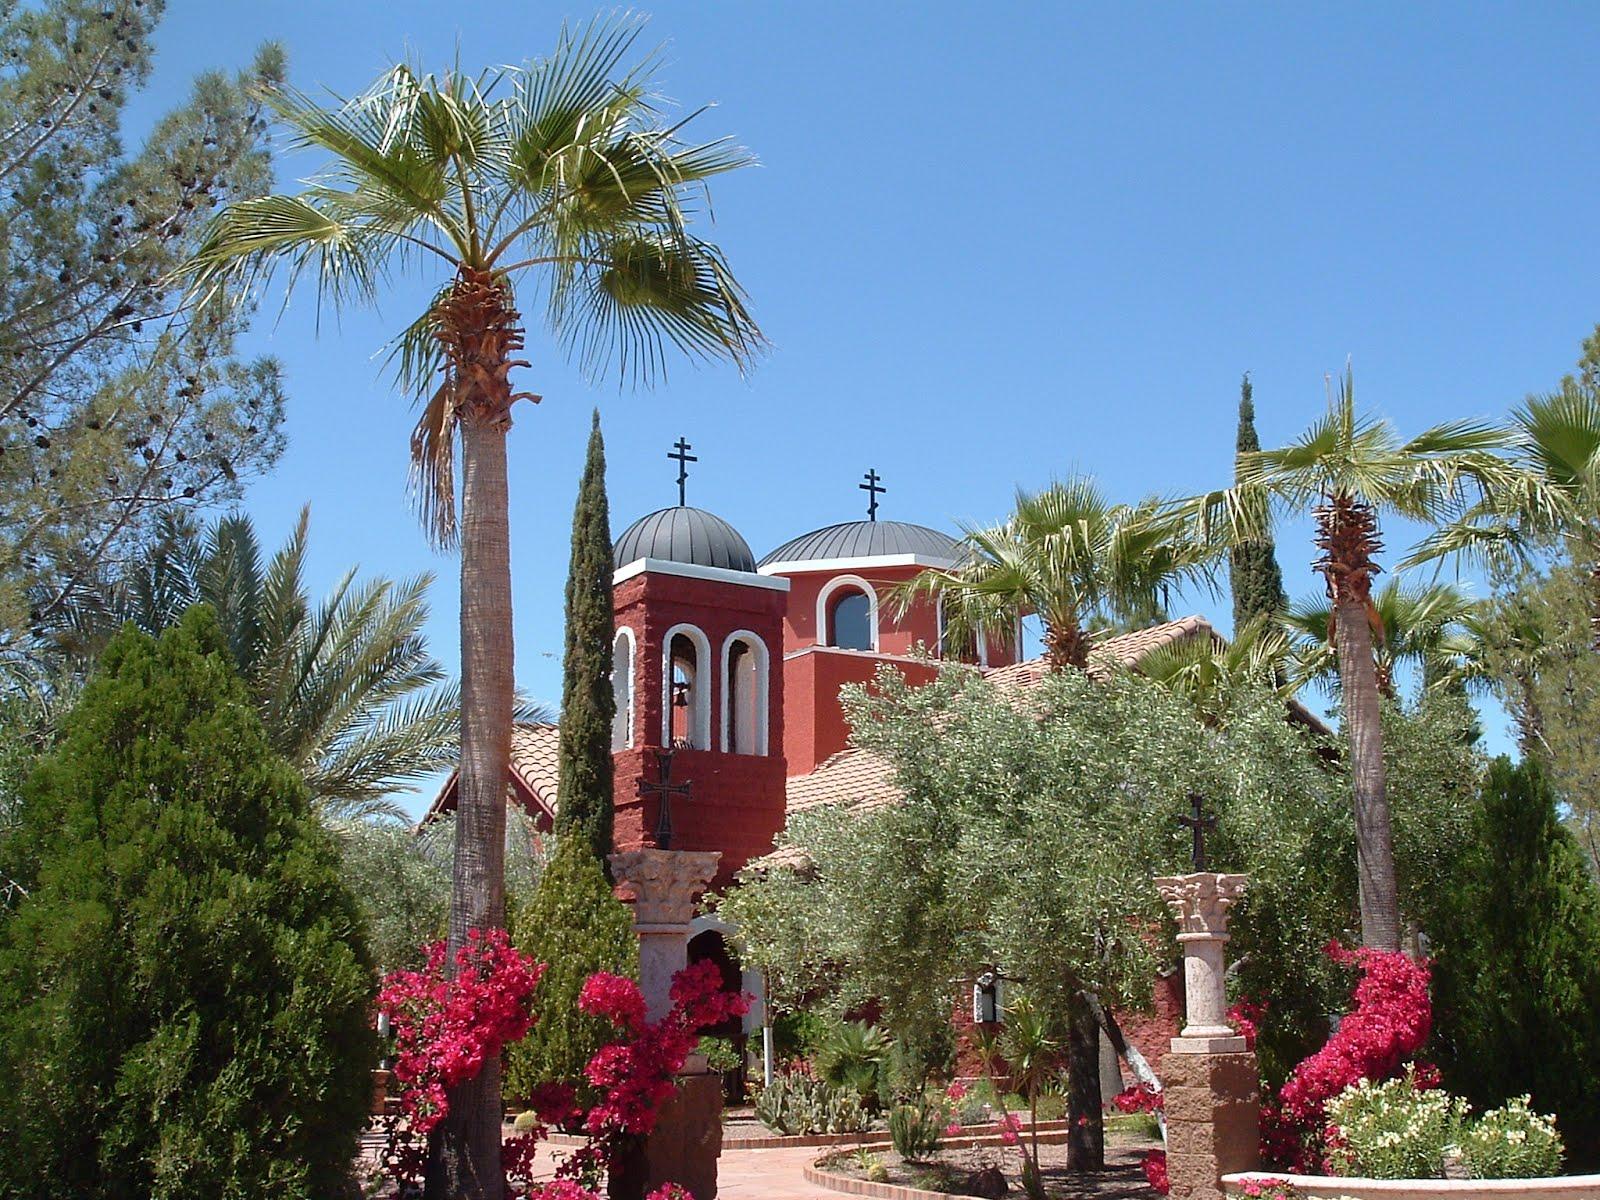 Kat S Chronicles 16 April 2012 St Anthony S Greek